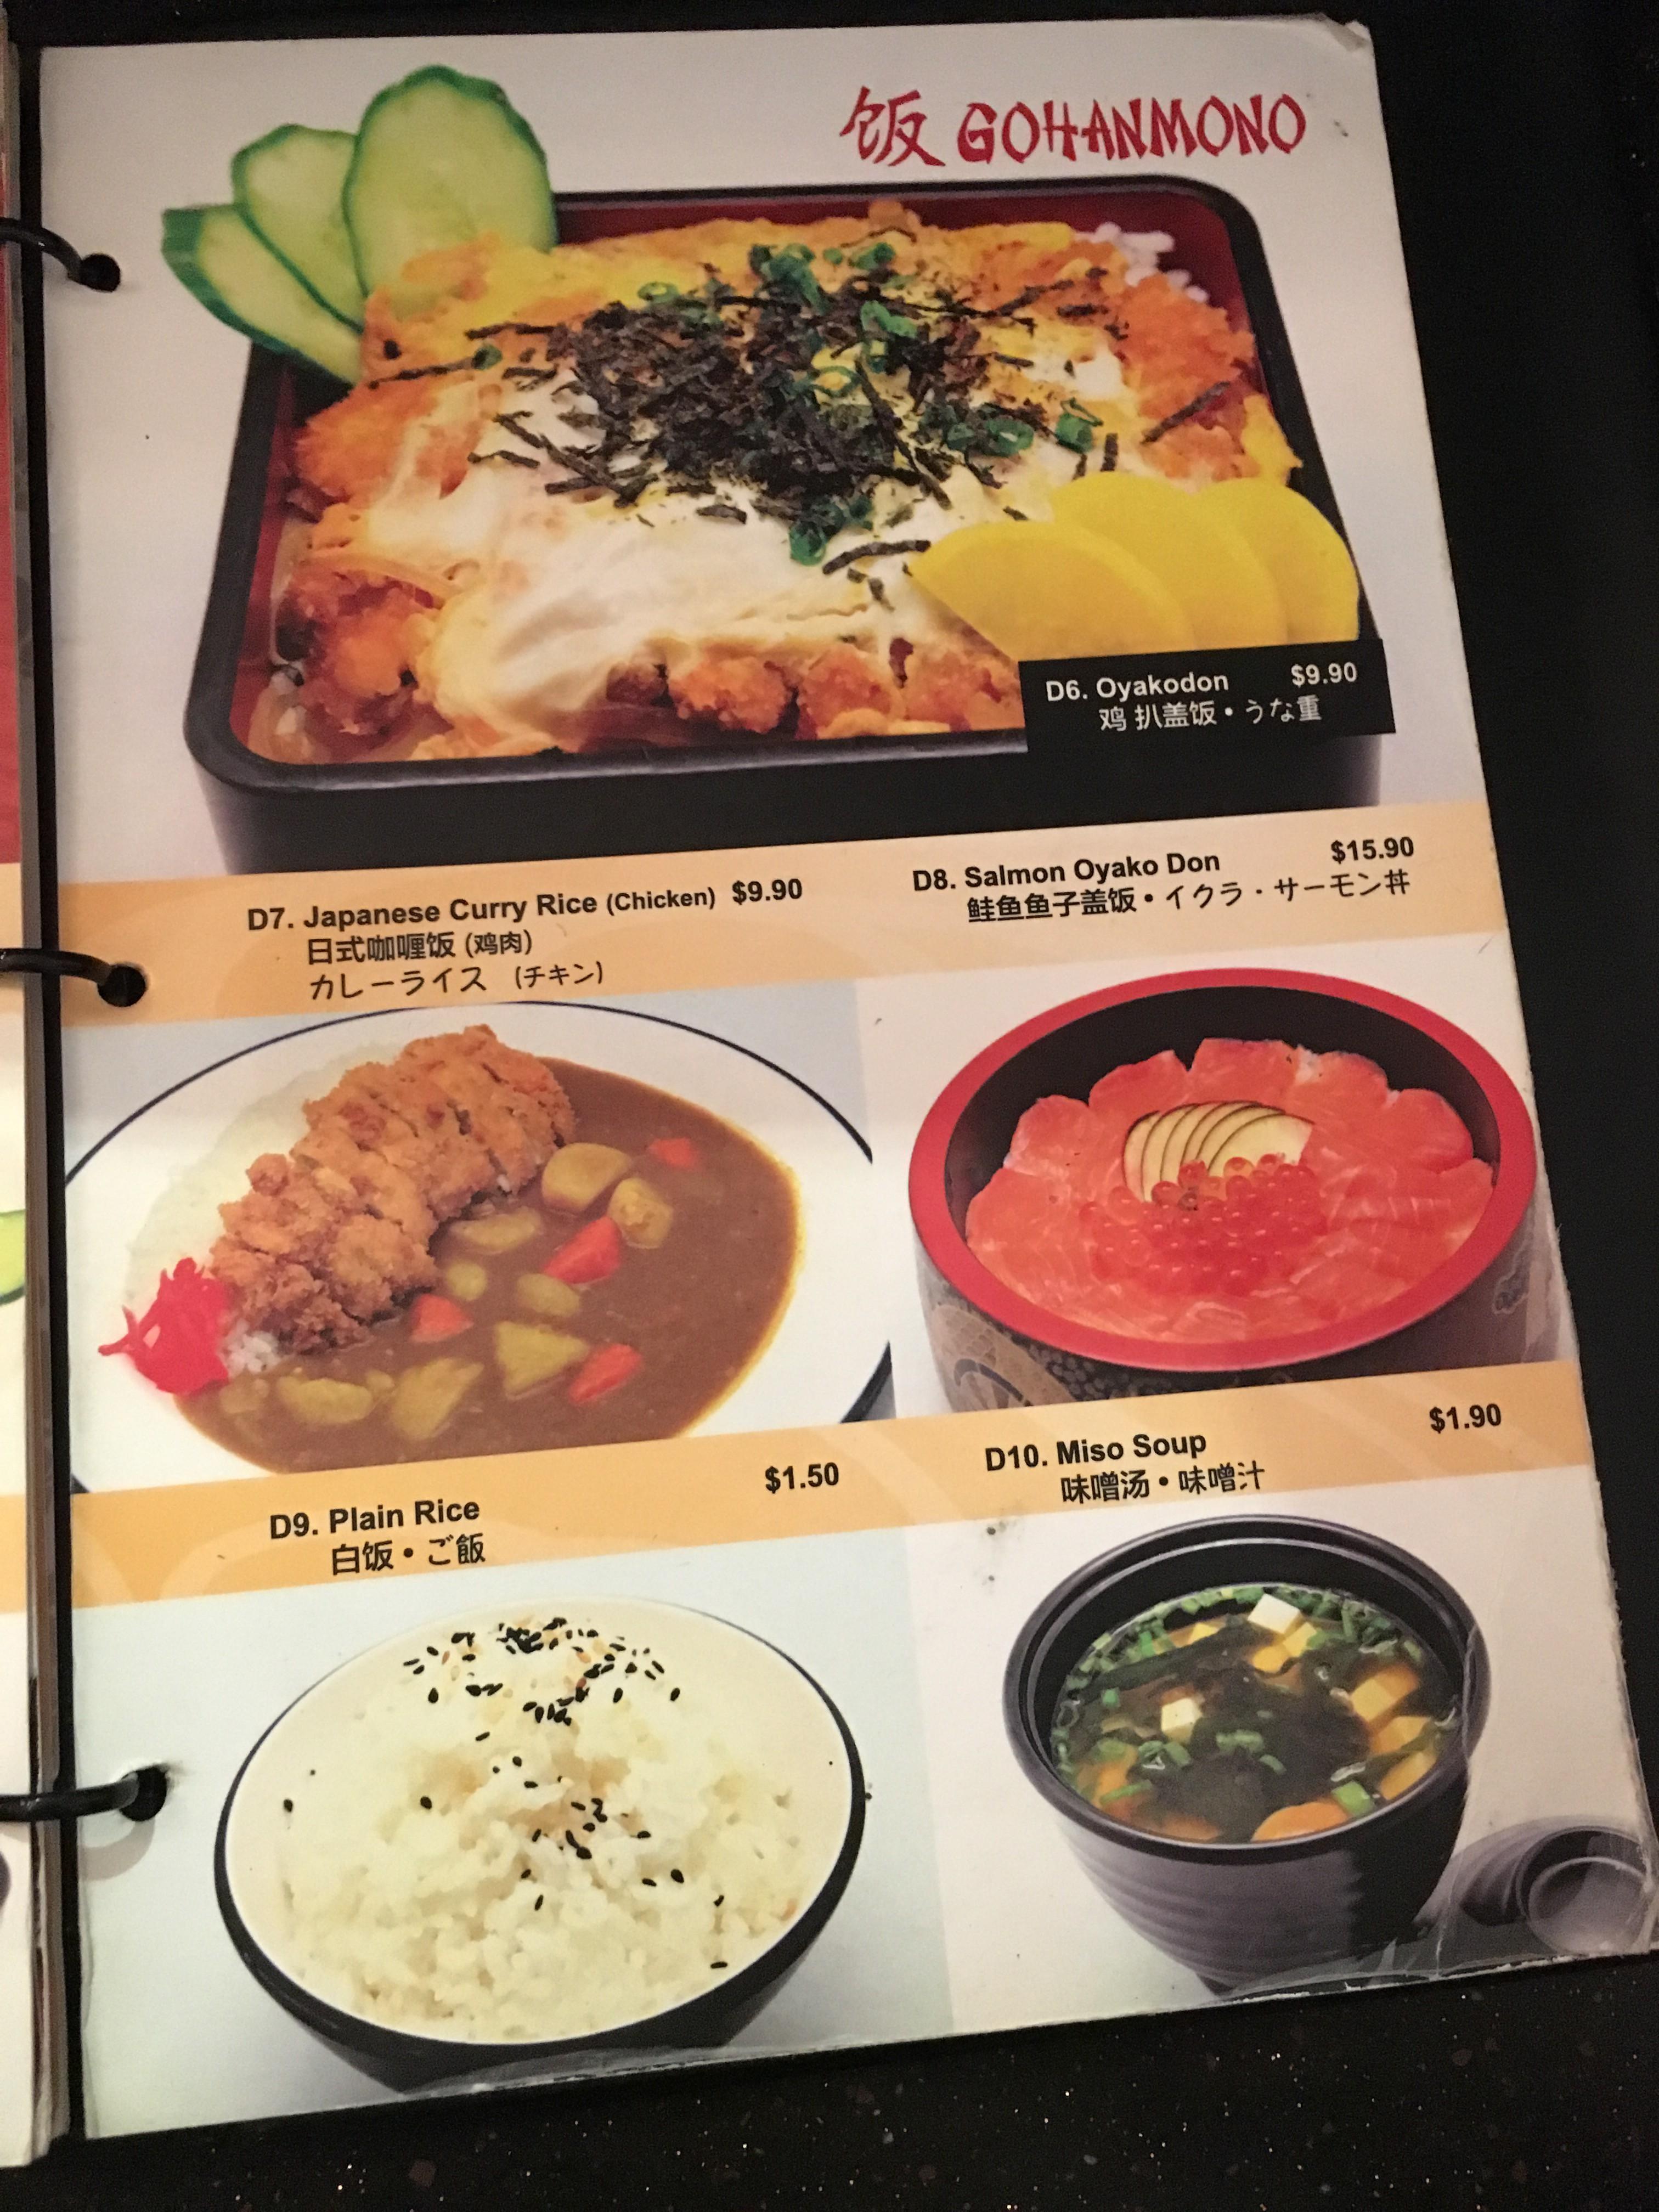 image | Halal Eats in Singapore